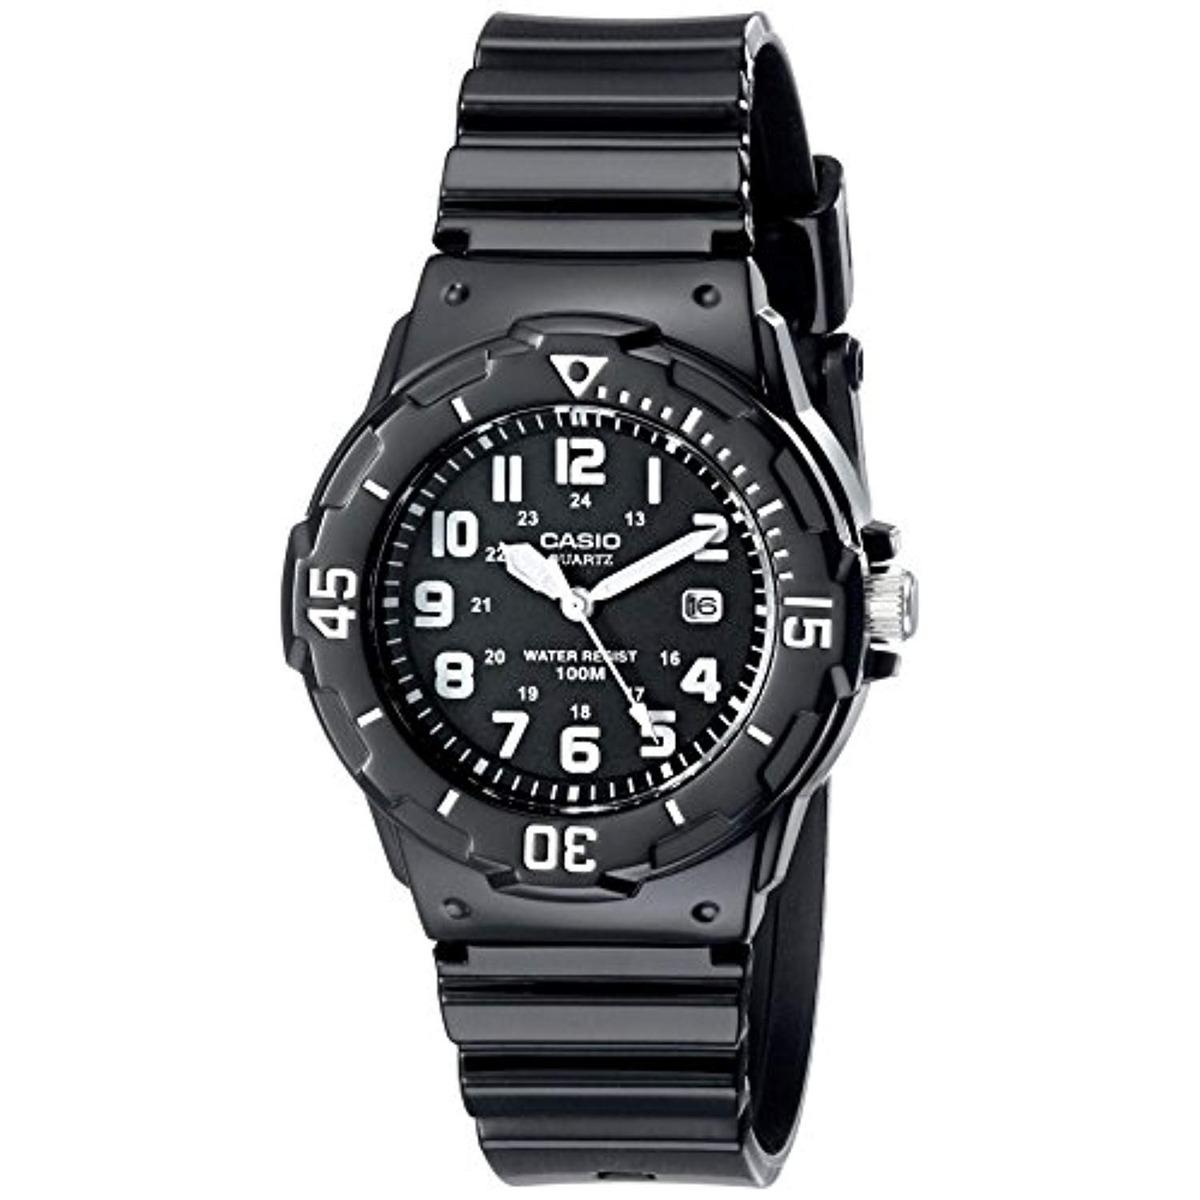 2c460a2aba85 Reloj De Pulso Mujer Casio Women X26 39 S -   135.533 en Mercado Libre